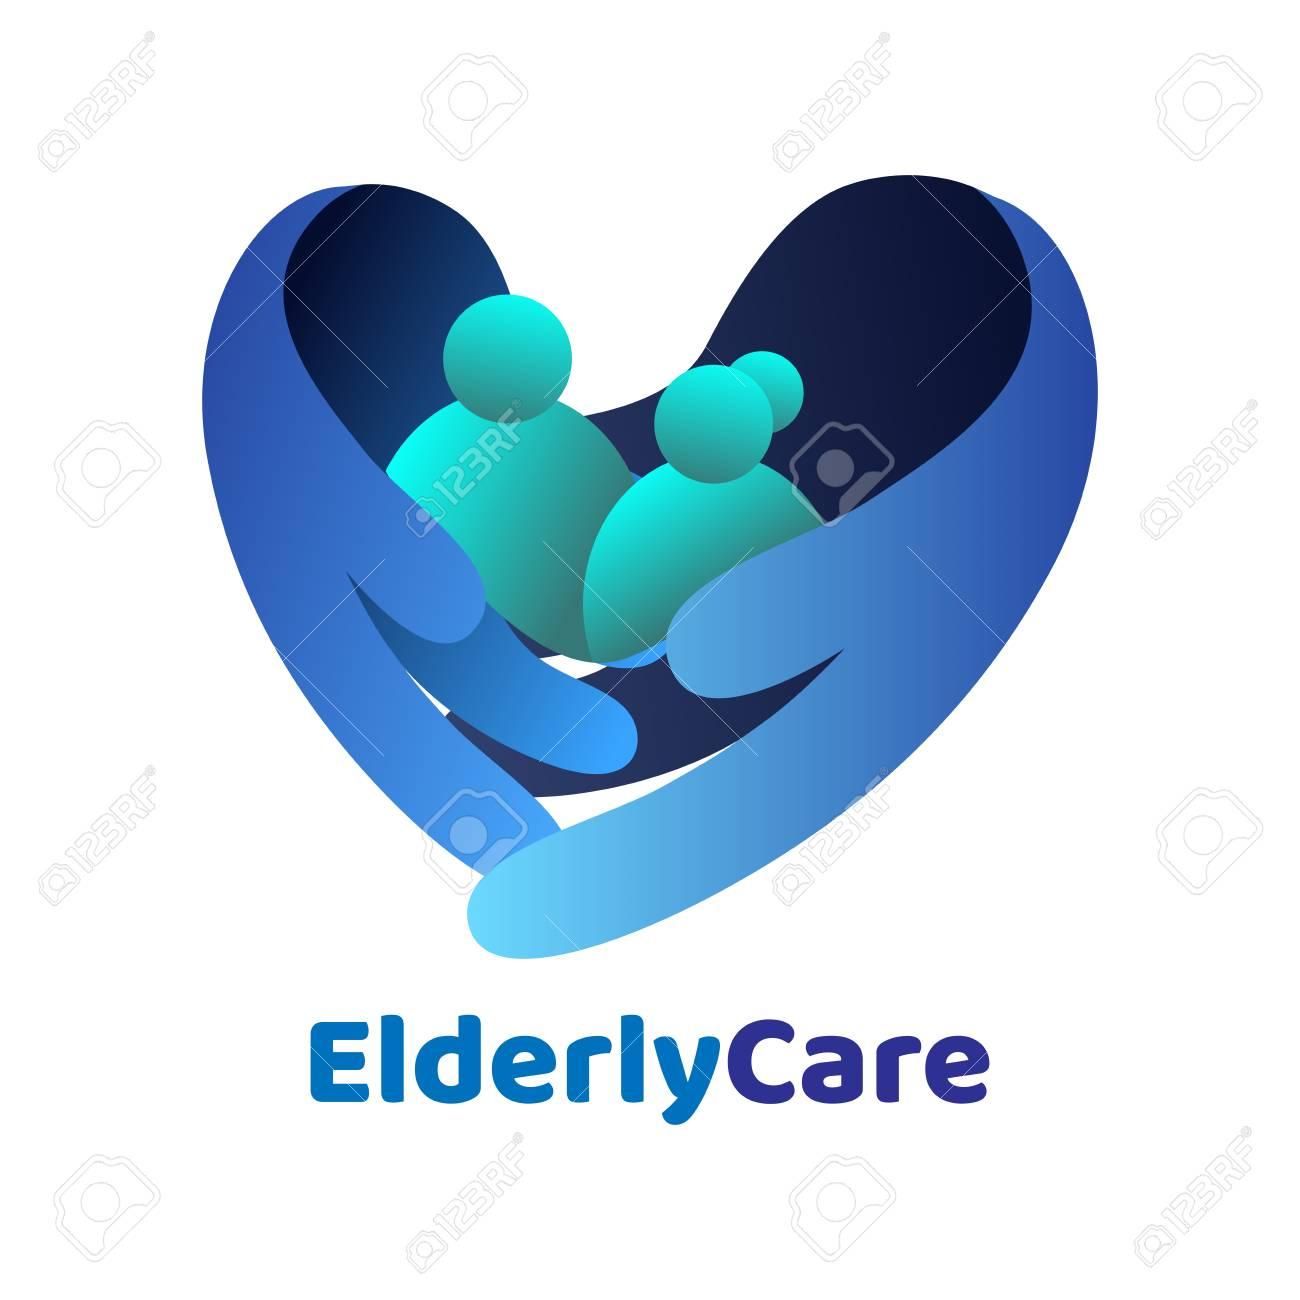 The Elder Group LLC